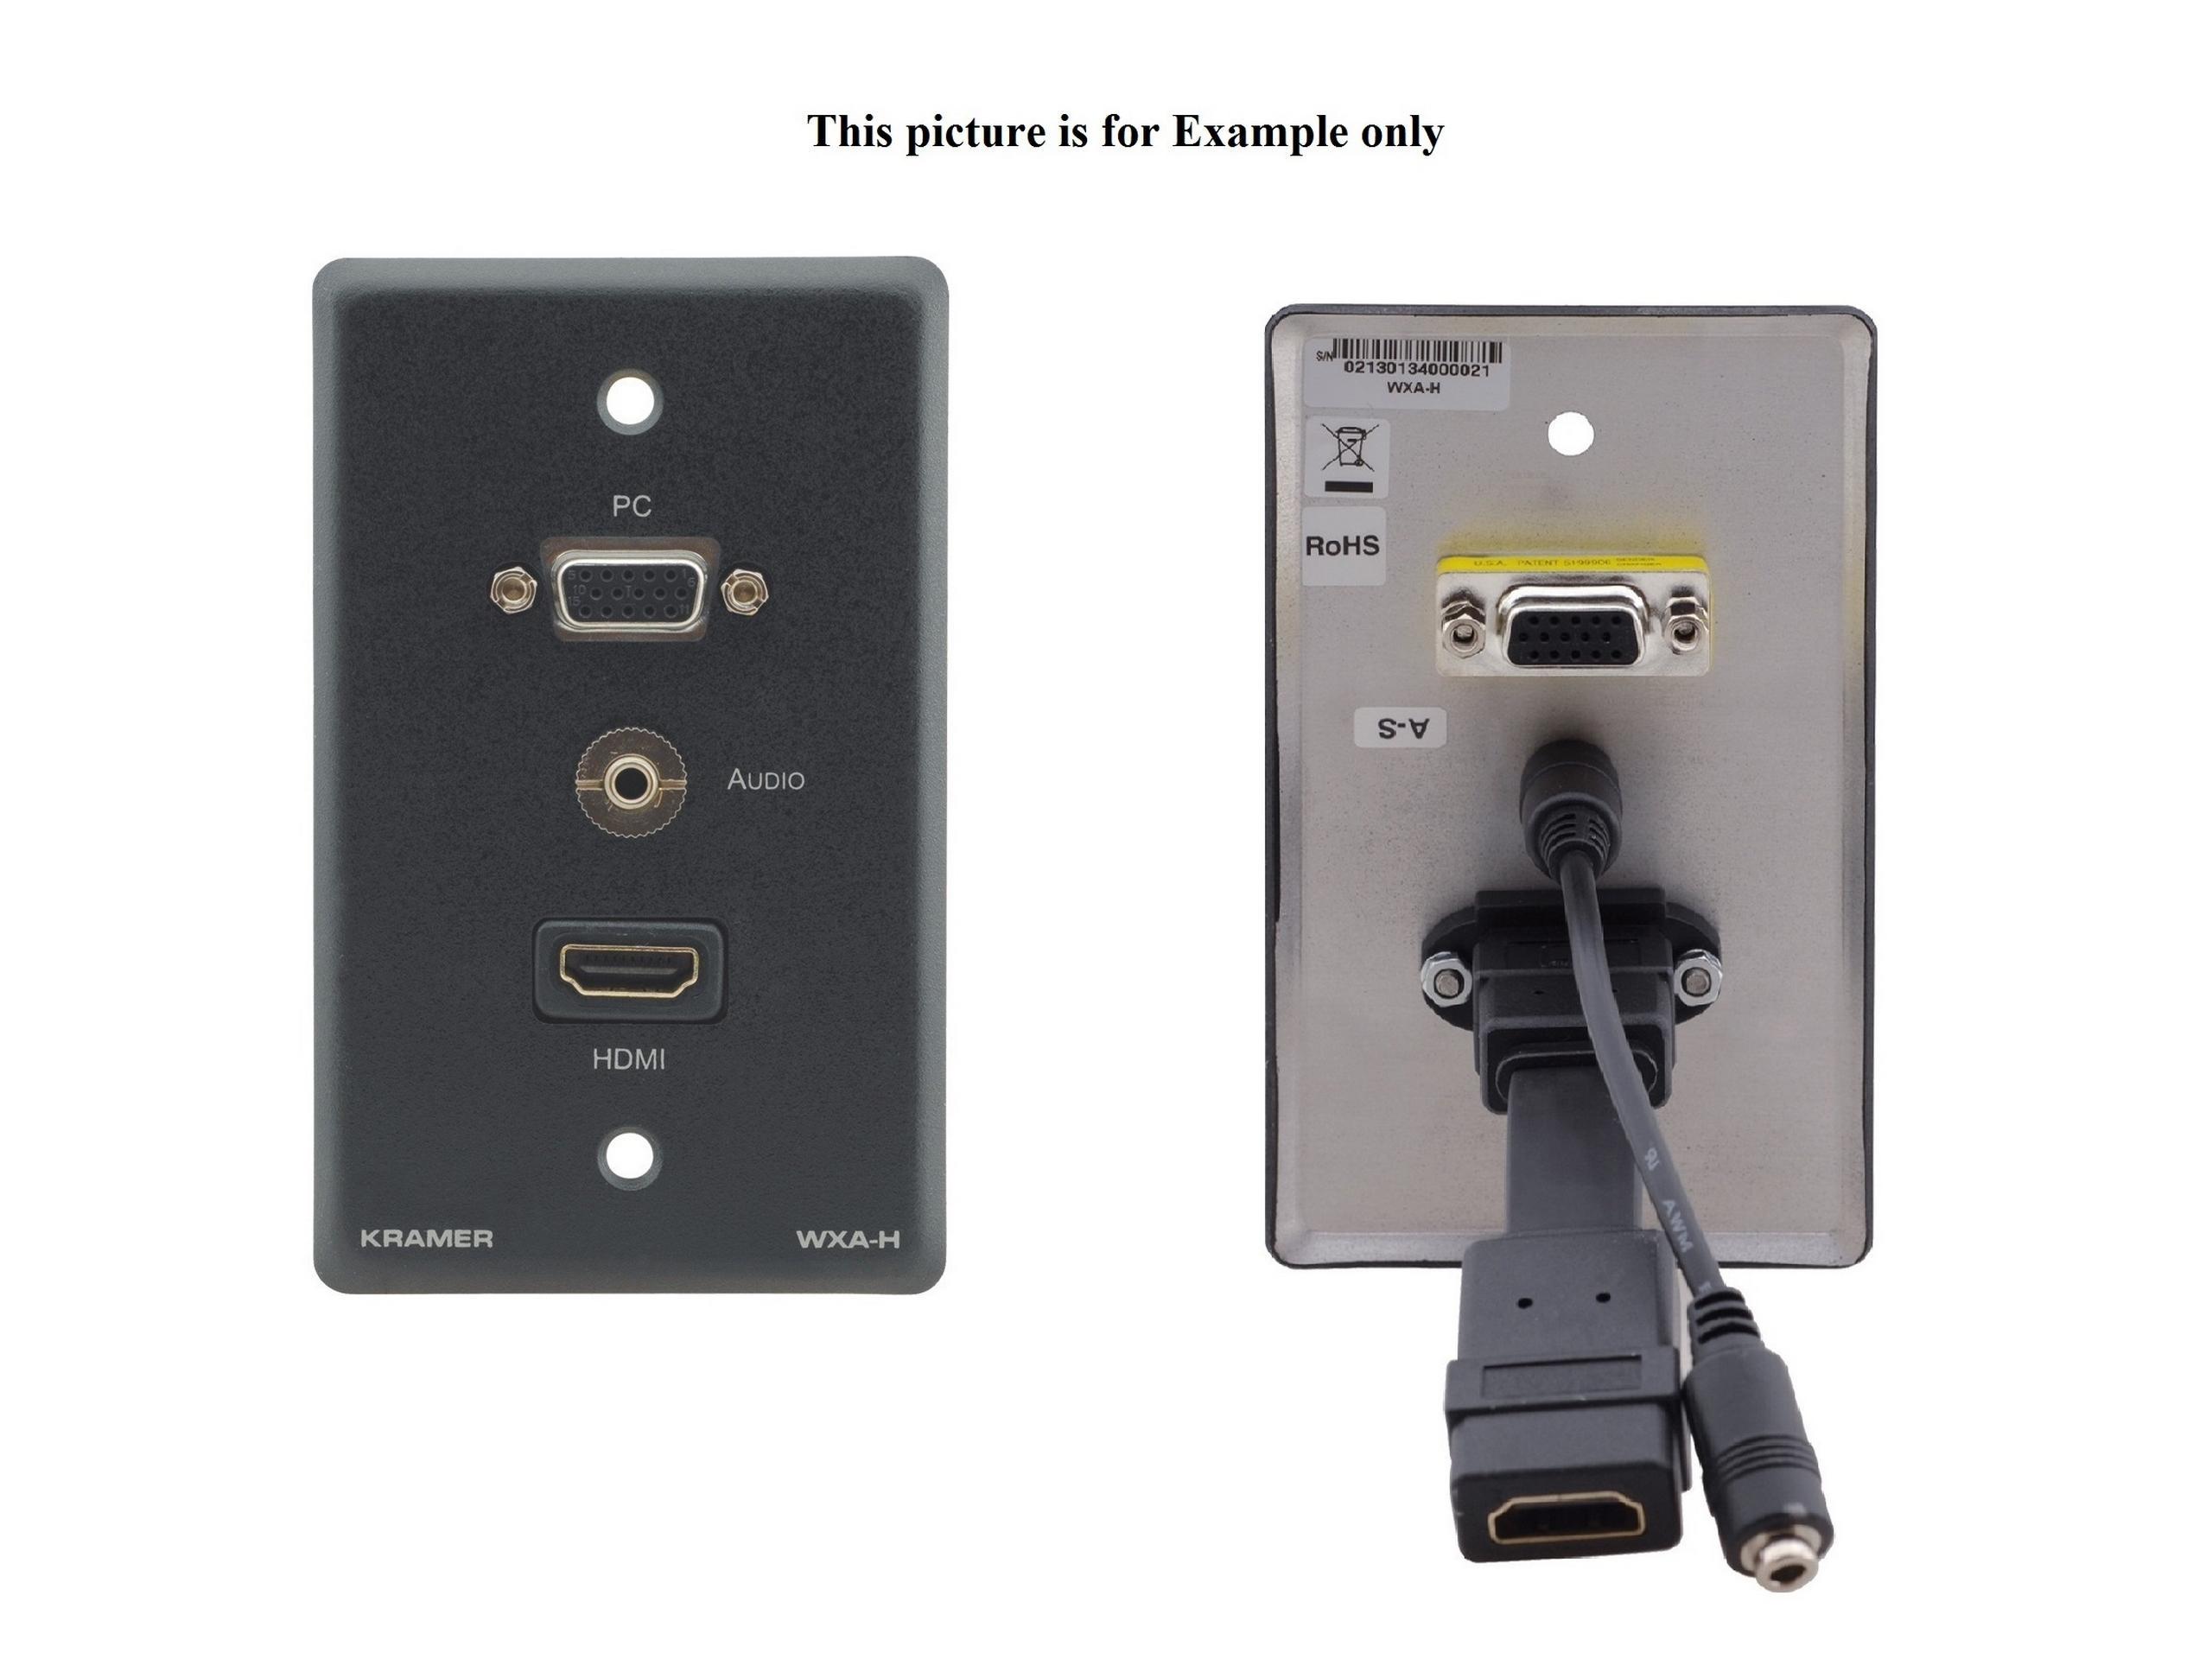 Kramer WXA-H-D(B) Passive Wall Plate/VGA 15-pin HD/3.5mm Audio/HDMI/Black